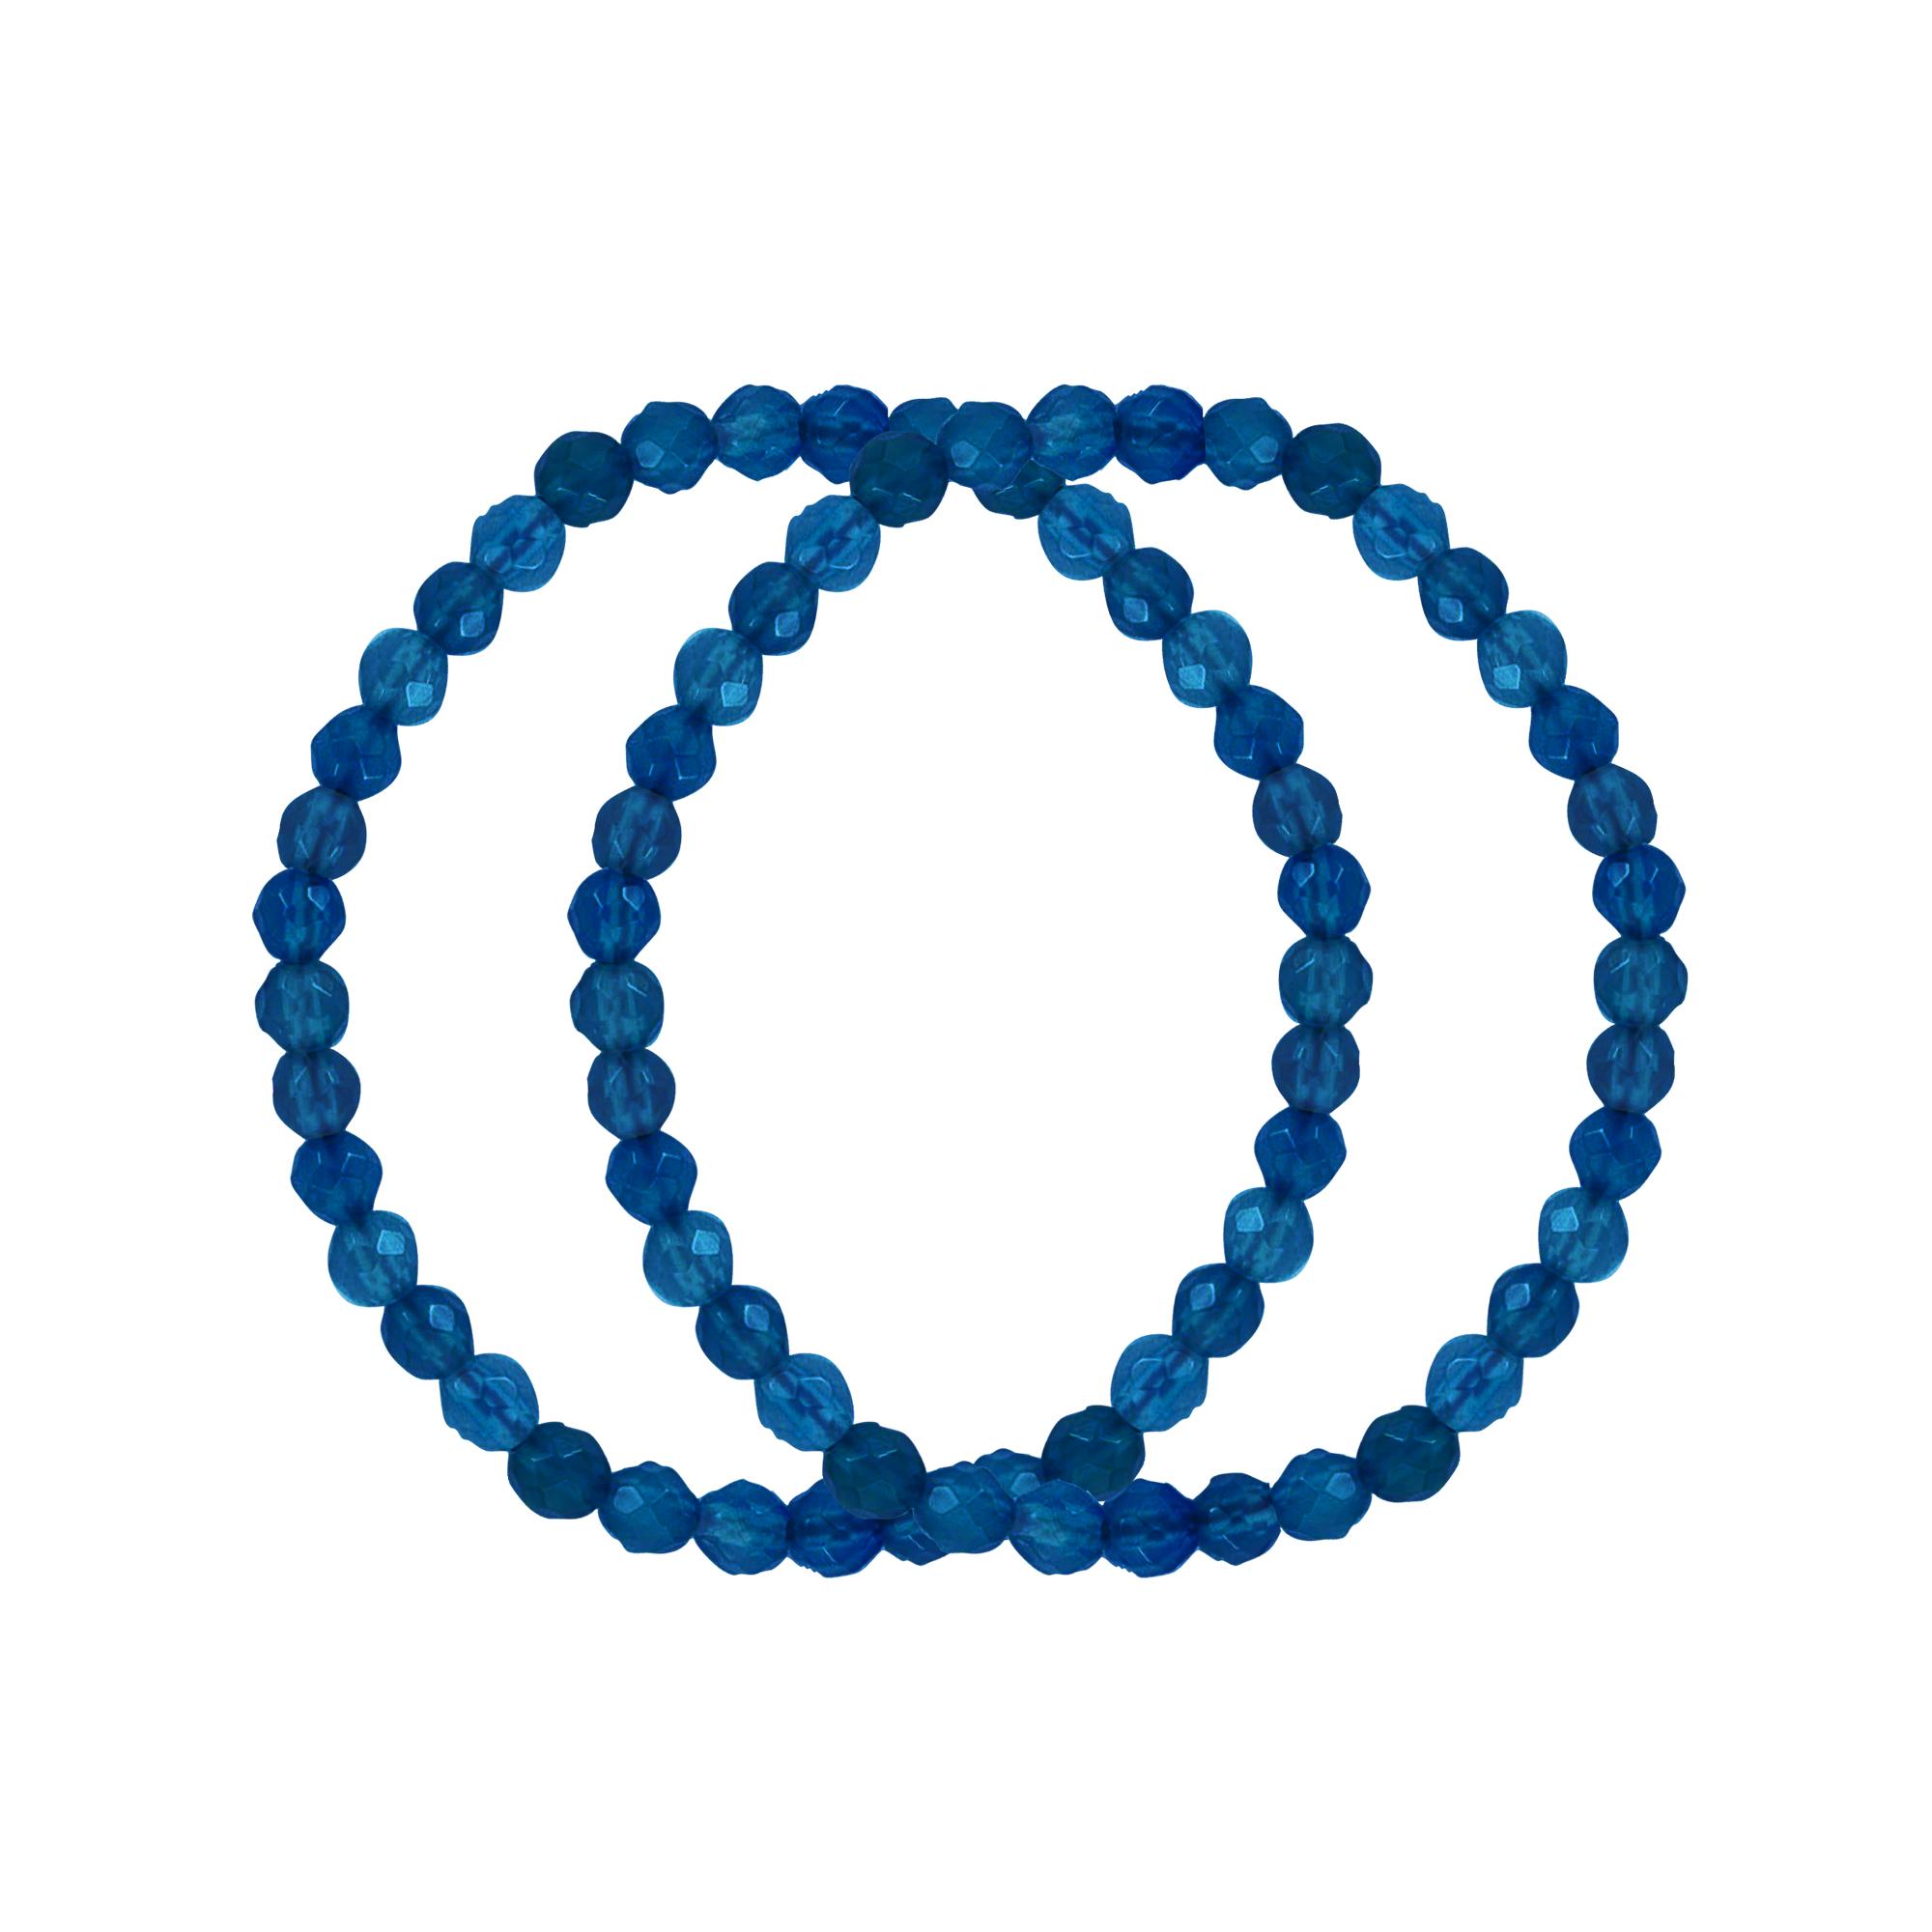 Silver Bracelet, Set Of 2 Dark Blu  Fac Qrtz Stretch Brac